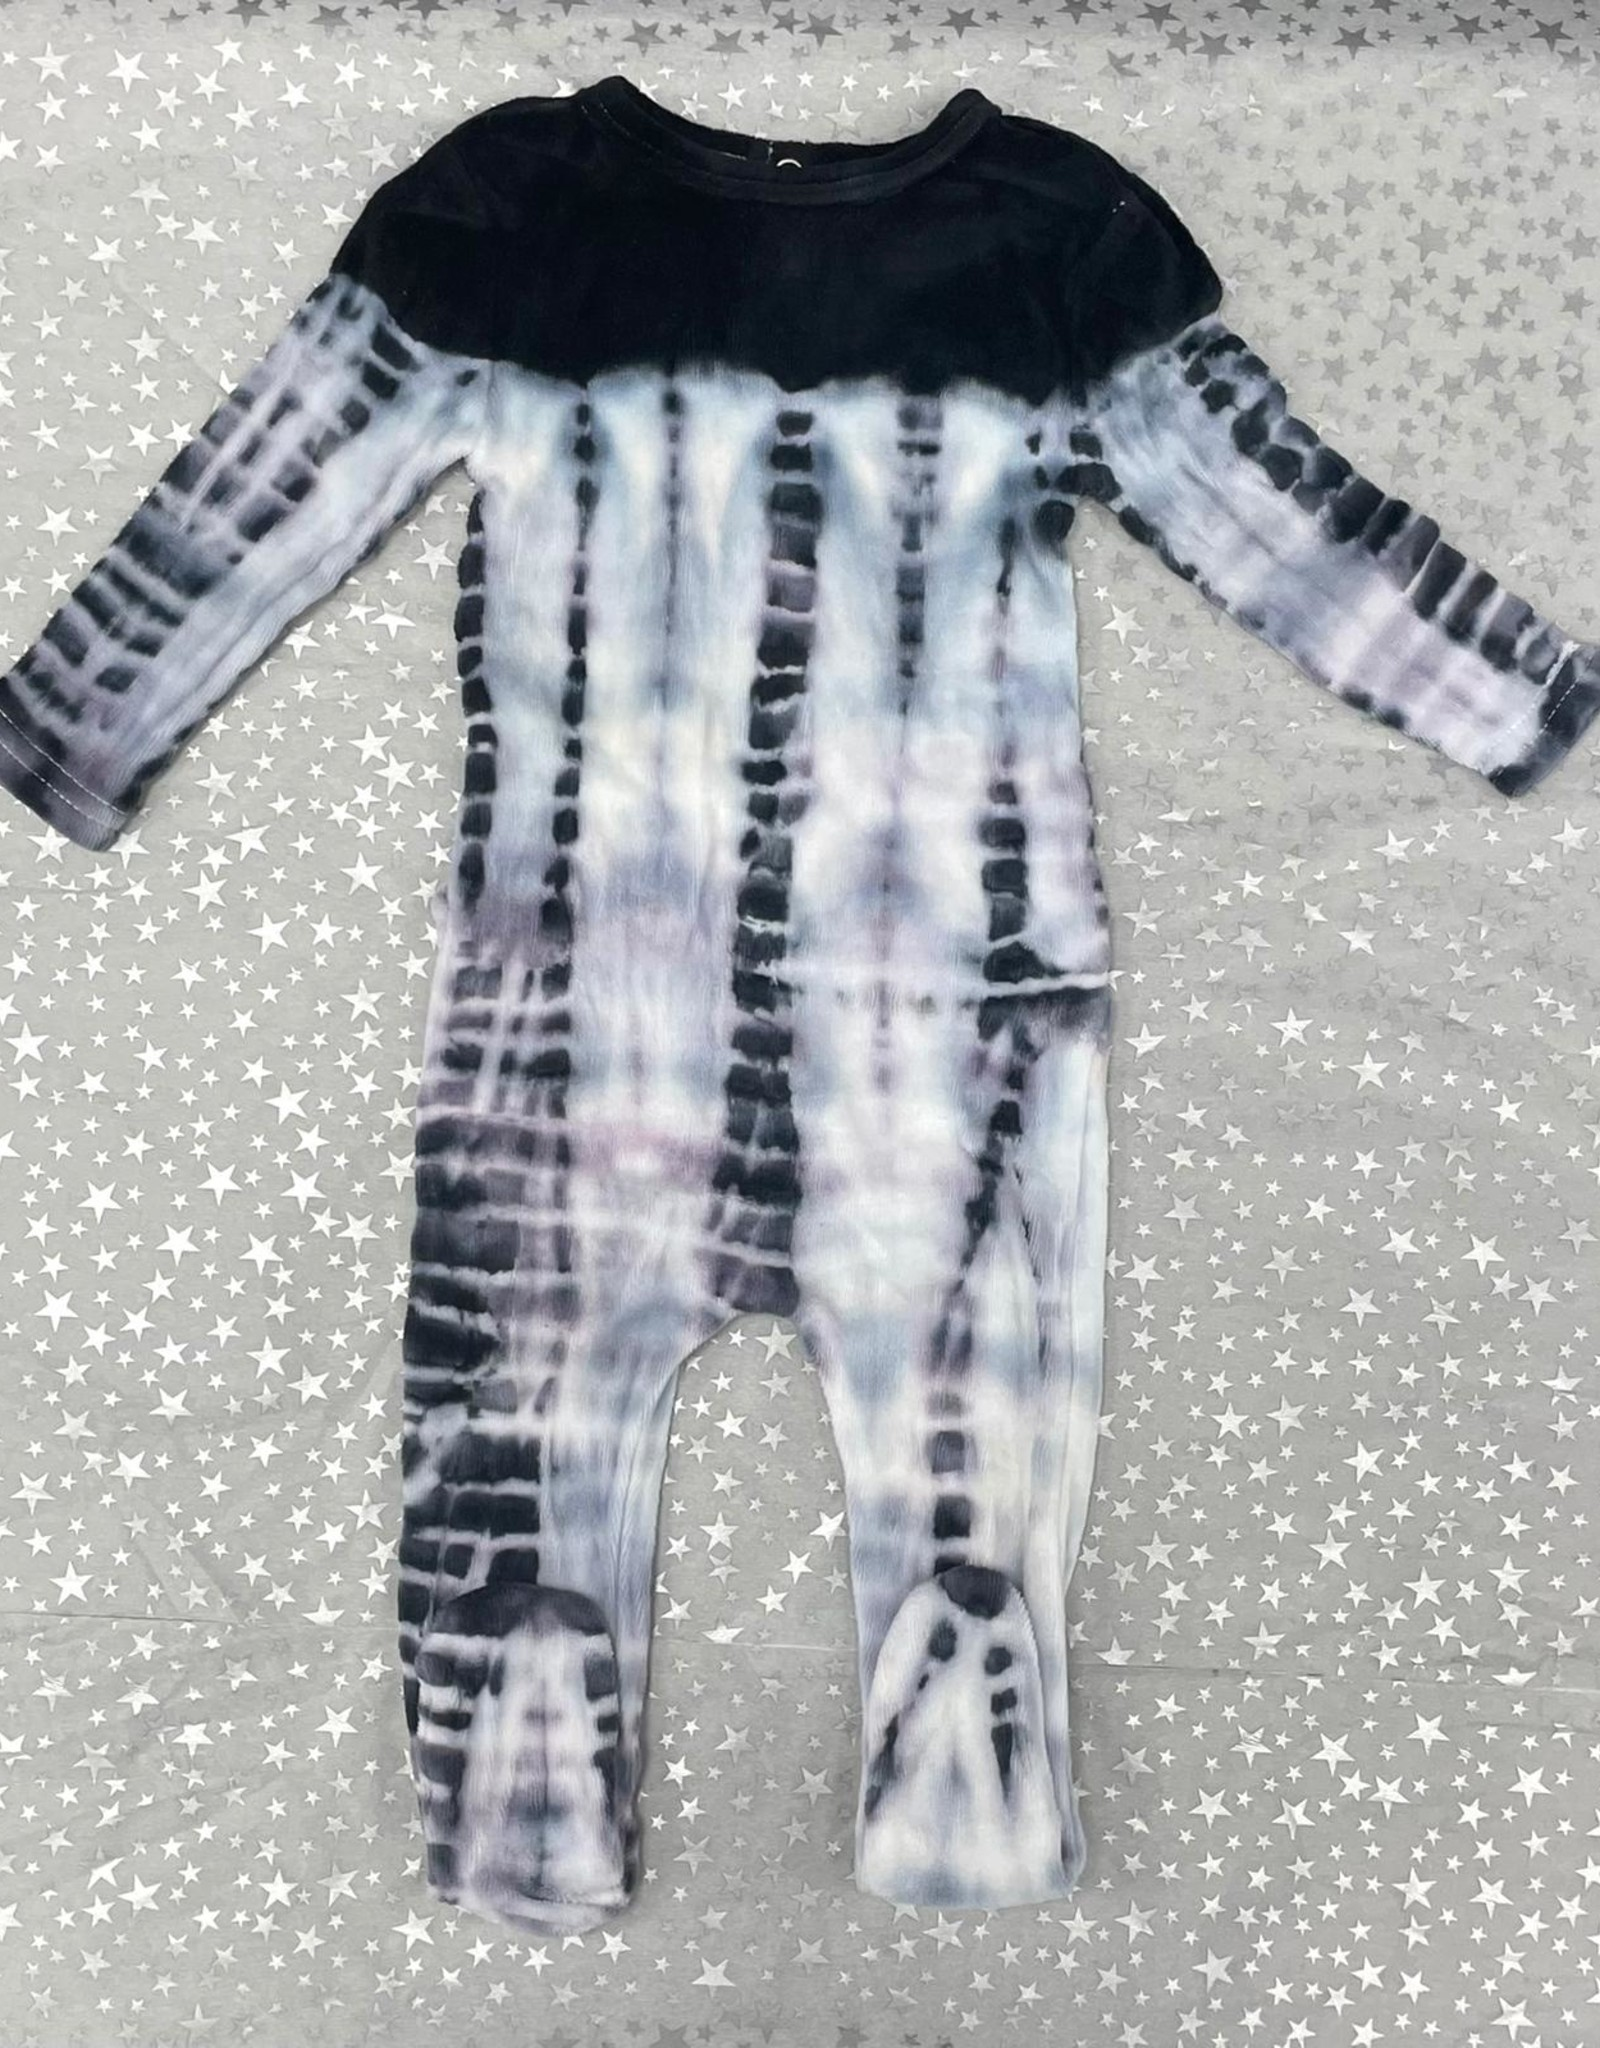 Noggi Noggi Velour Tie Dye Footie Pajama